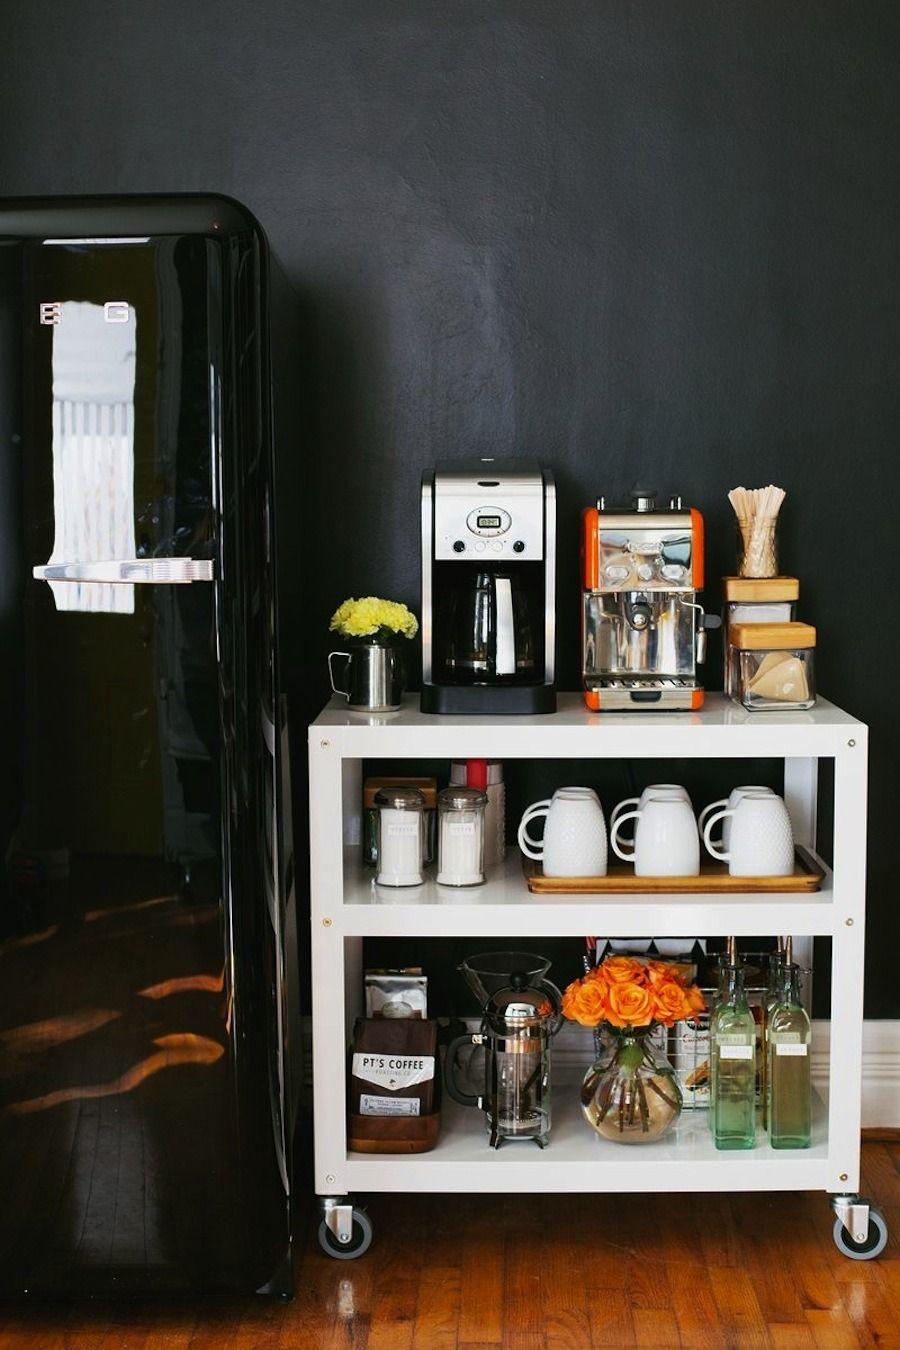 Make your own storage: http://www.stylemepretty.com/living/2014/05/01/18-kitchen-organization-tips-tricks/